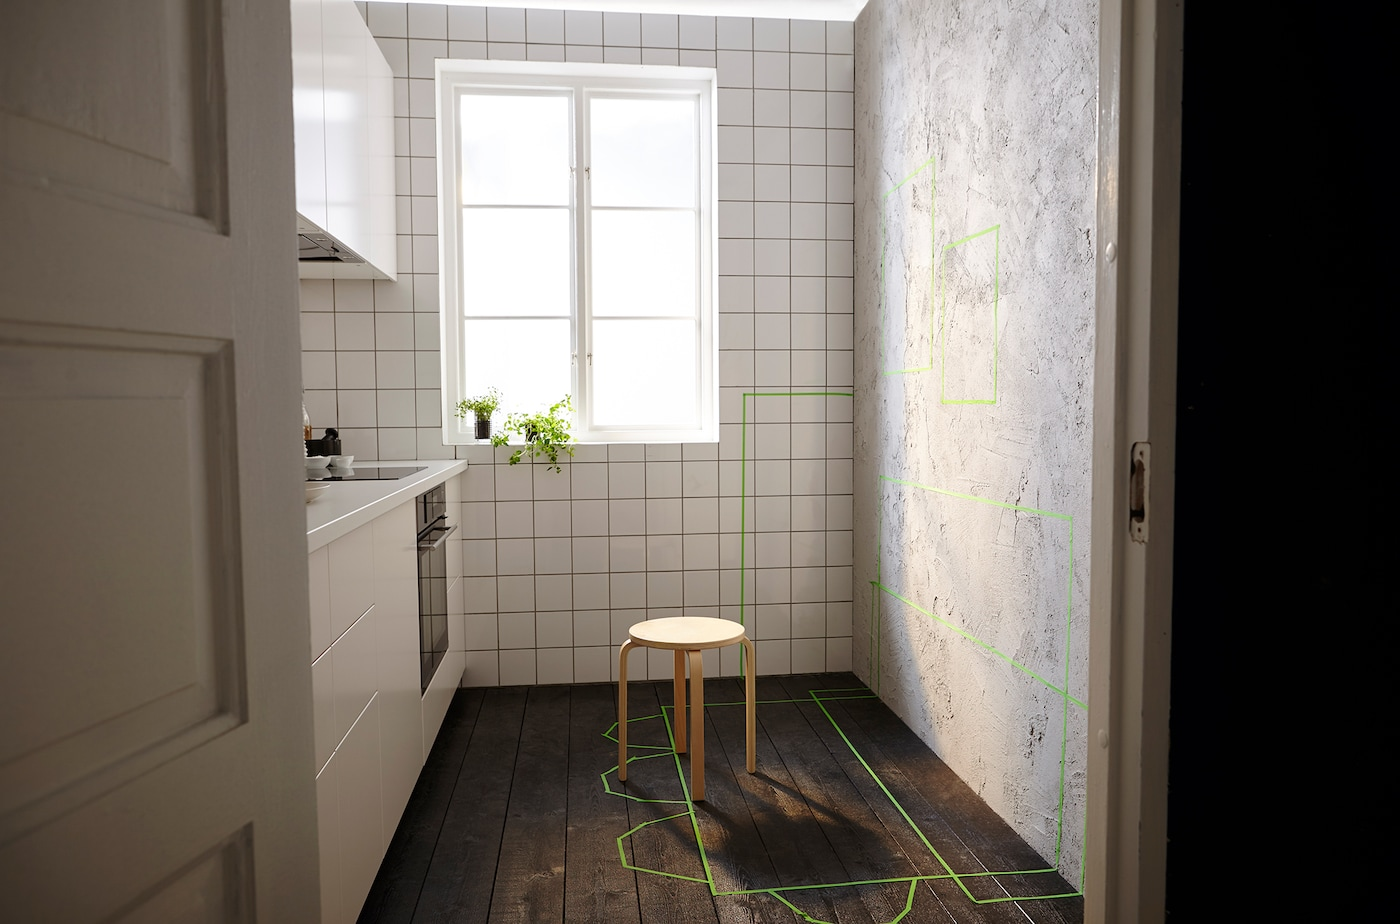 berraschende ideen f r schmale k chen ikea. Black Bedroom Furniture Sets. Home Design Ideas